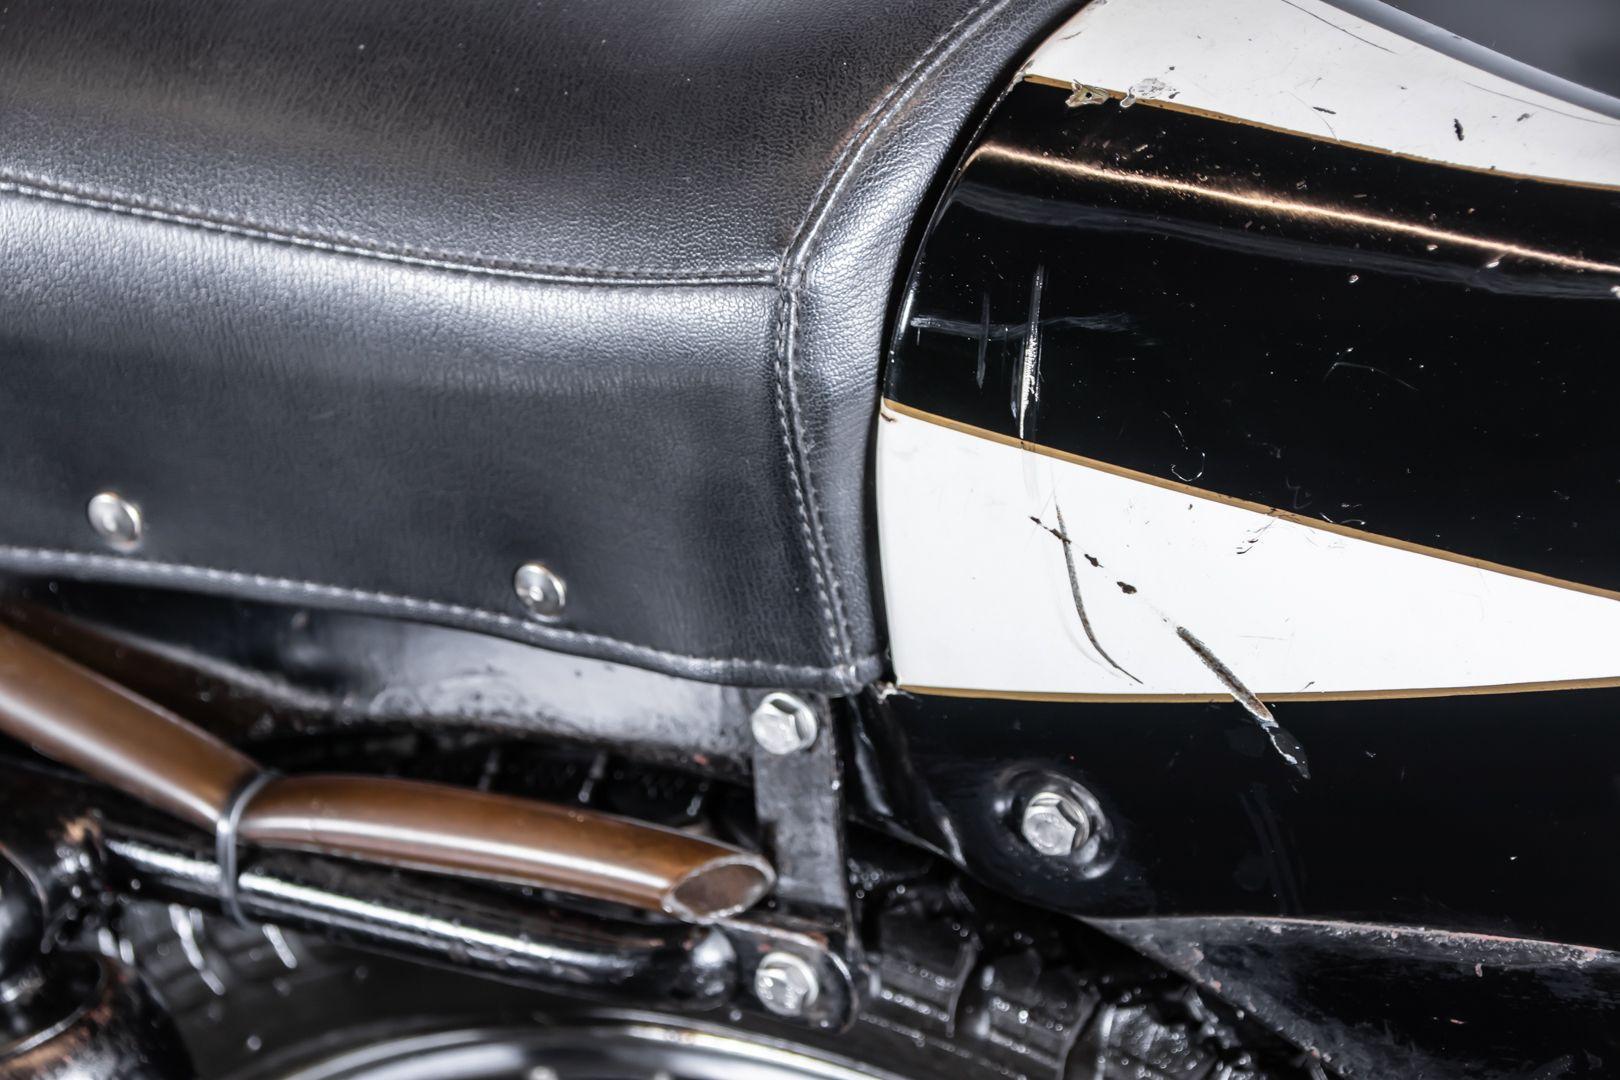 1960 Moto Morini Tresette Sprint 175 76477